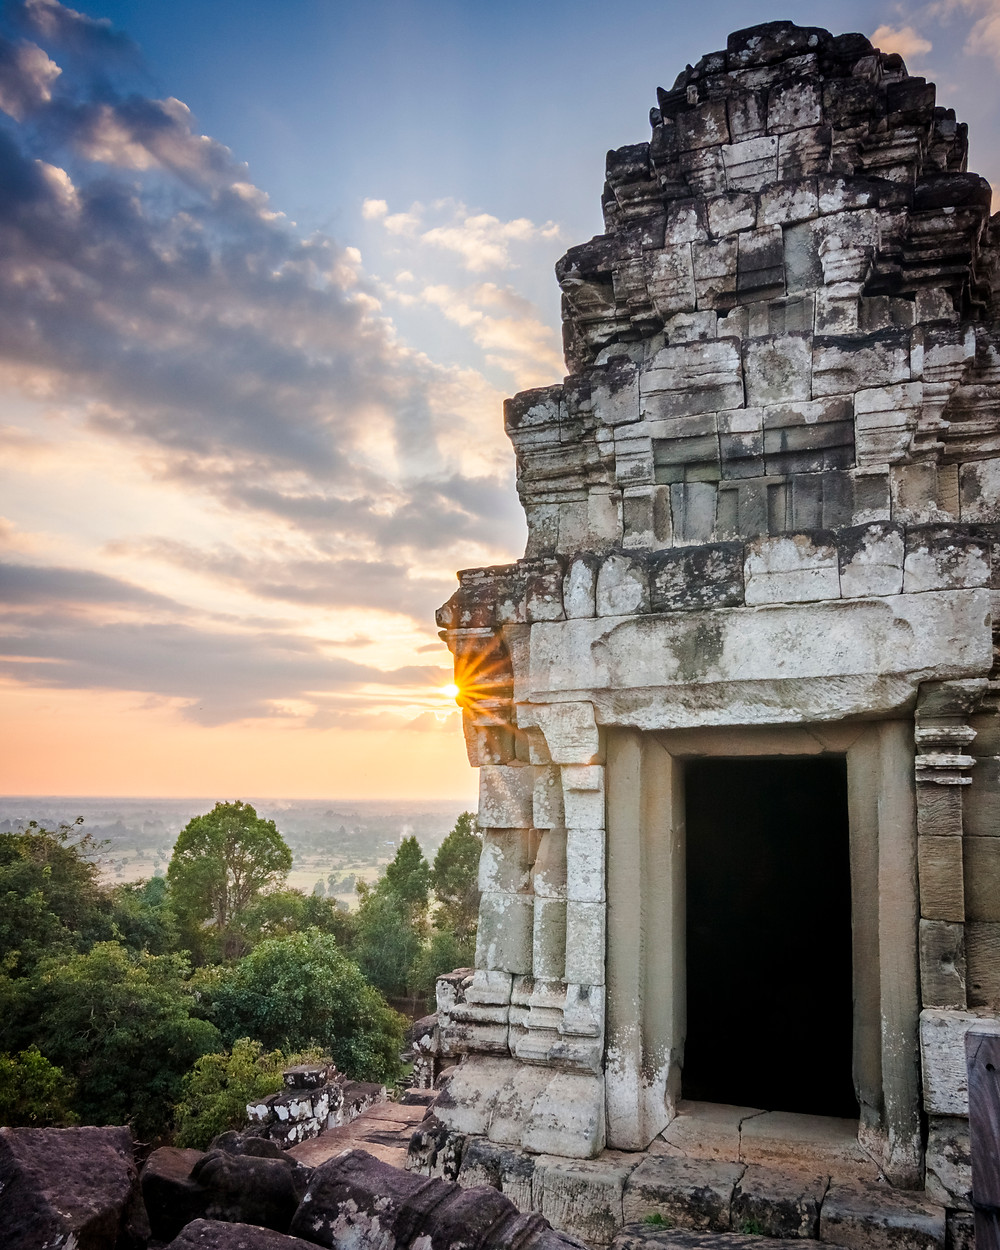 Phnom Bakheng, Angkor Wat, Cambodia